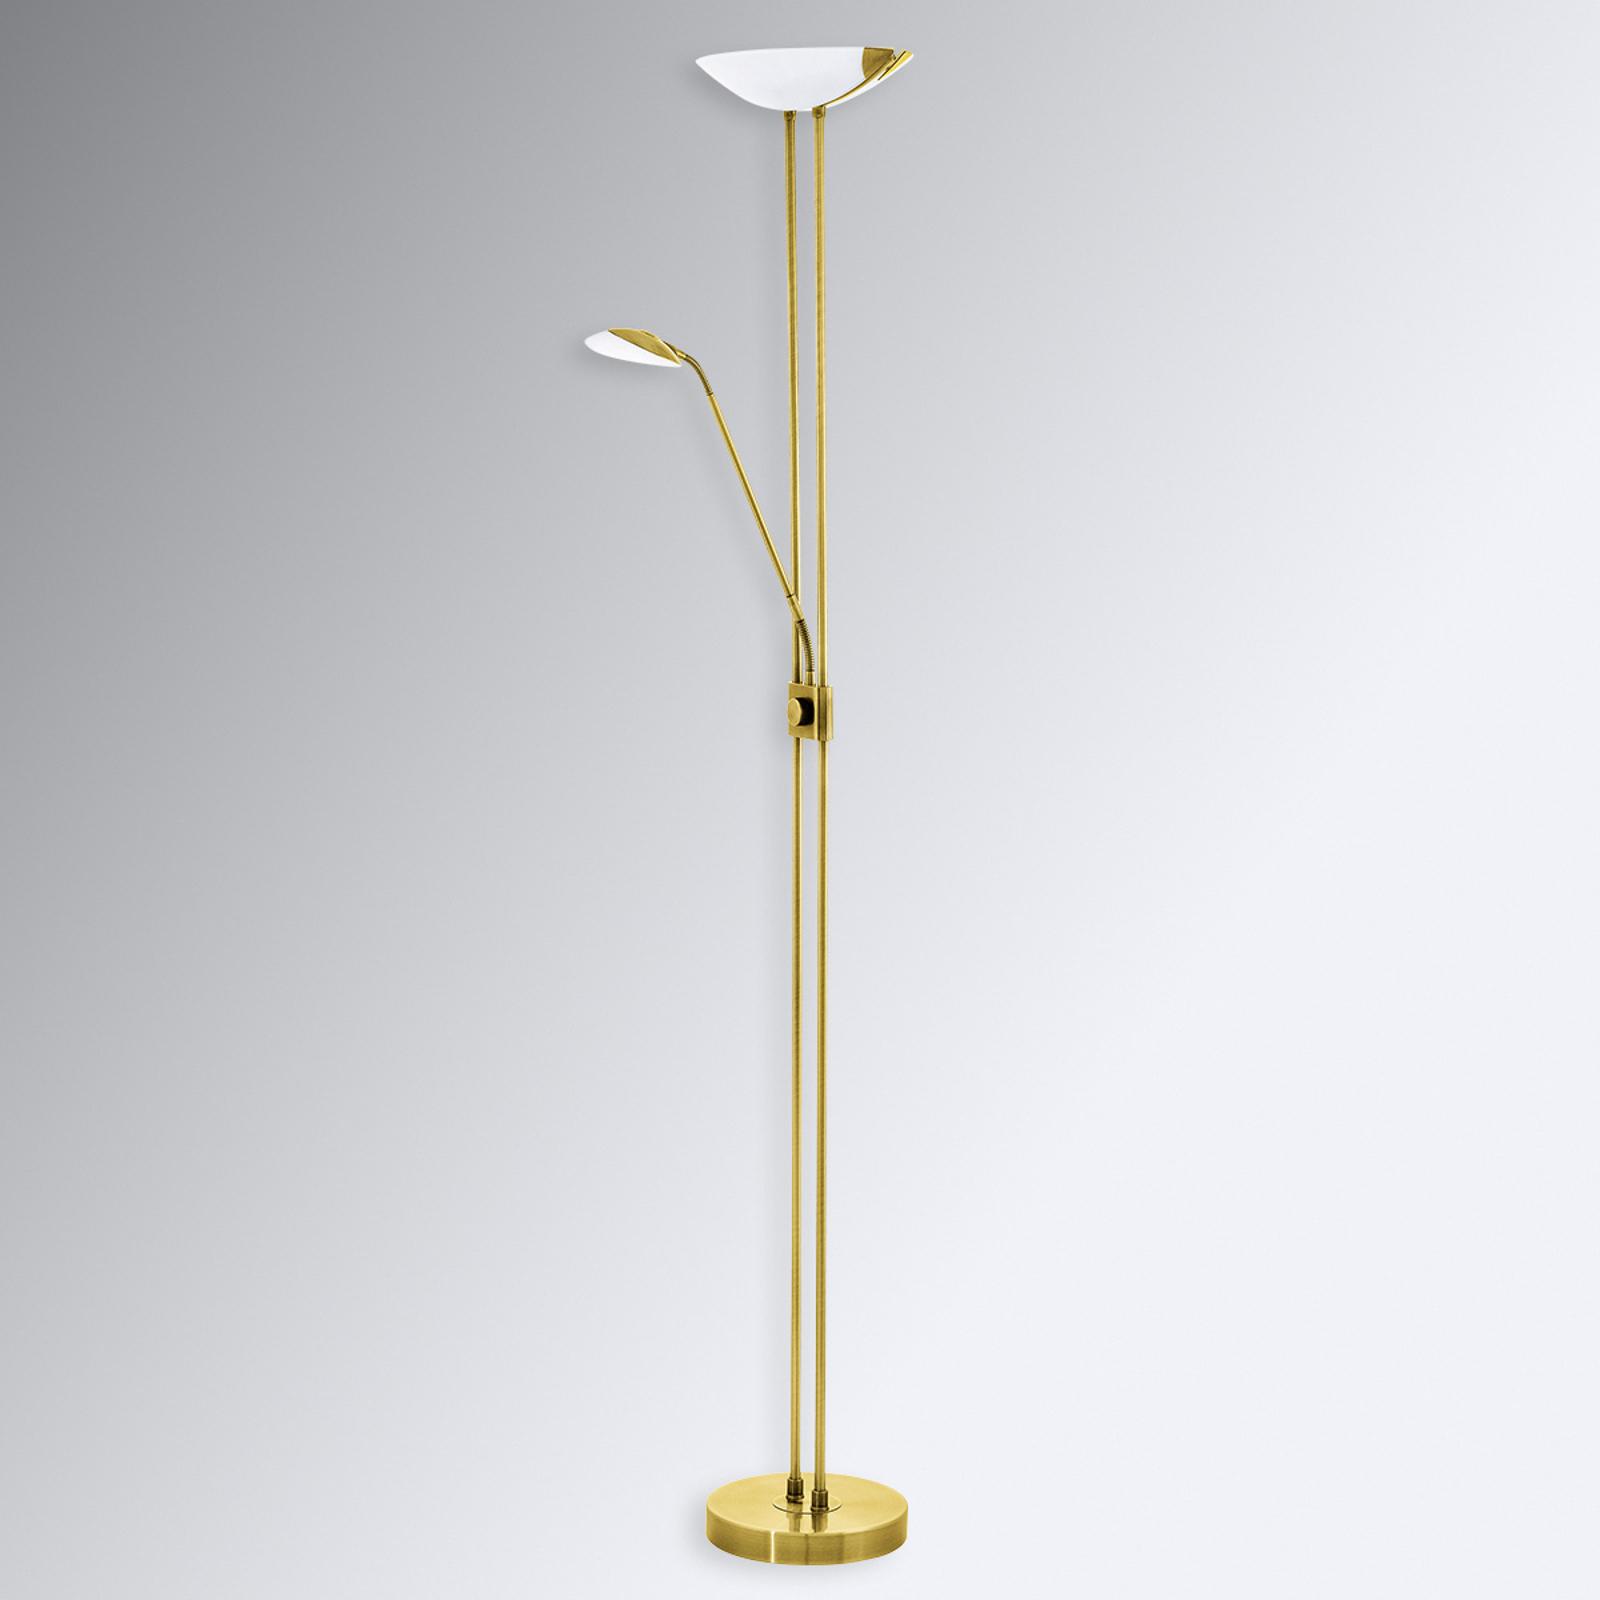 LED-Stehlampe Baya in Messingoptik